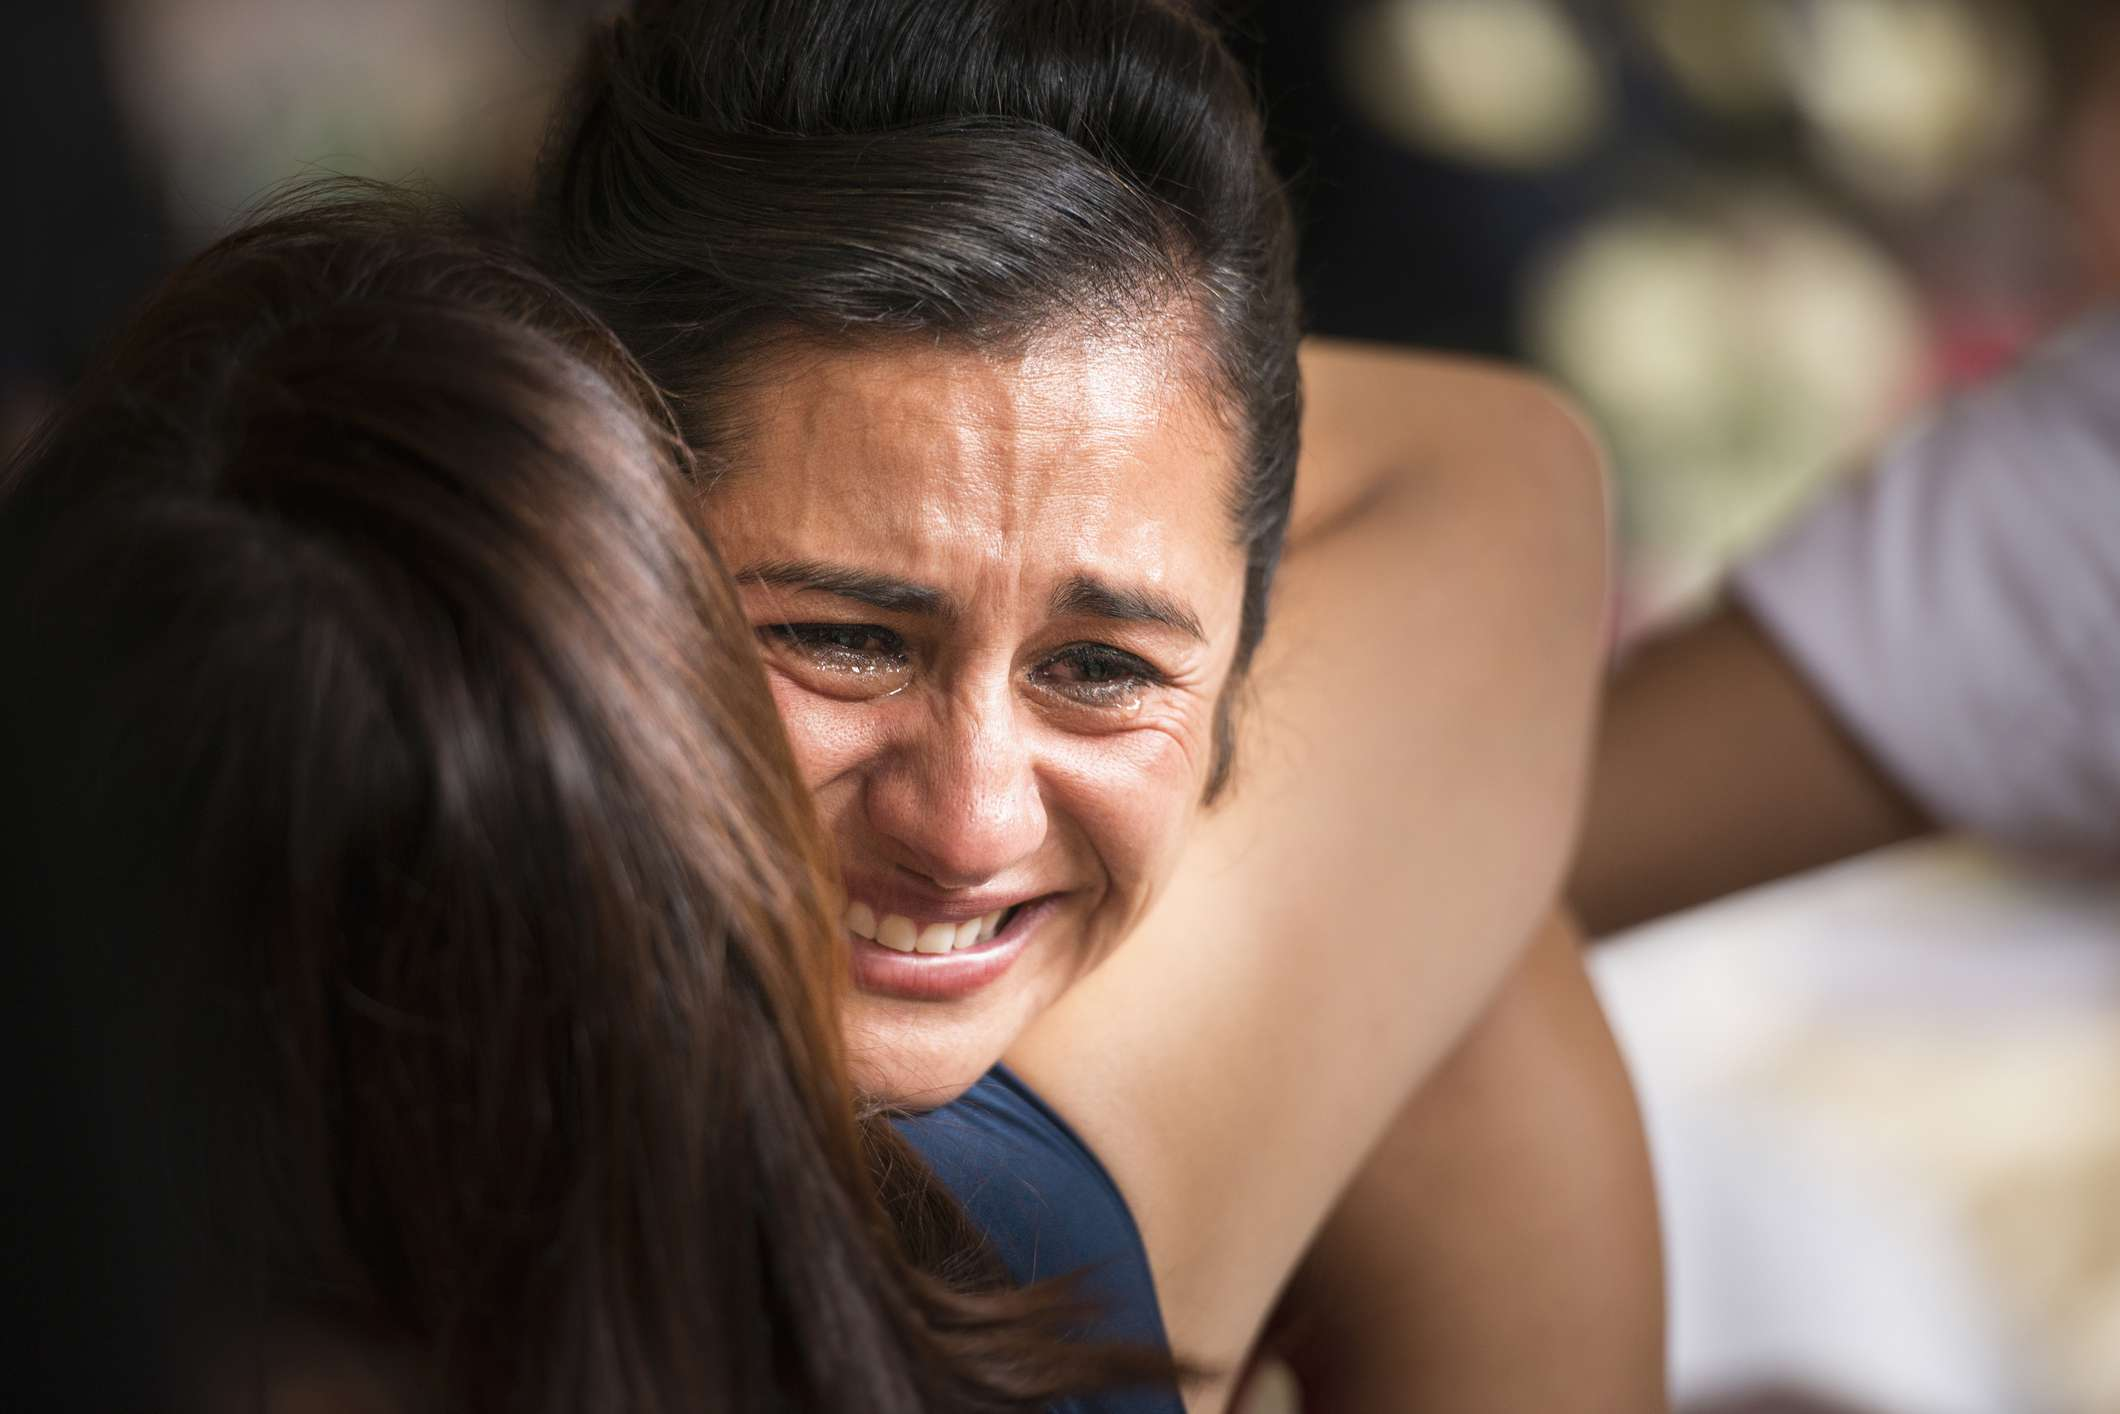 Hispanic women hugging and crying